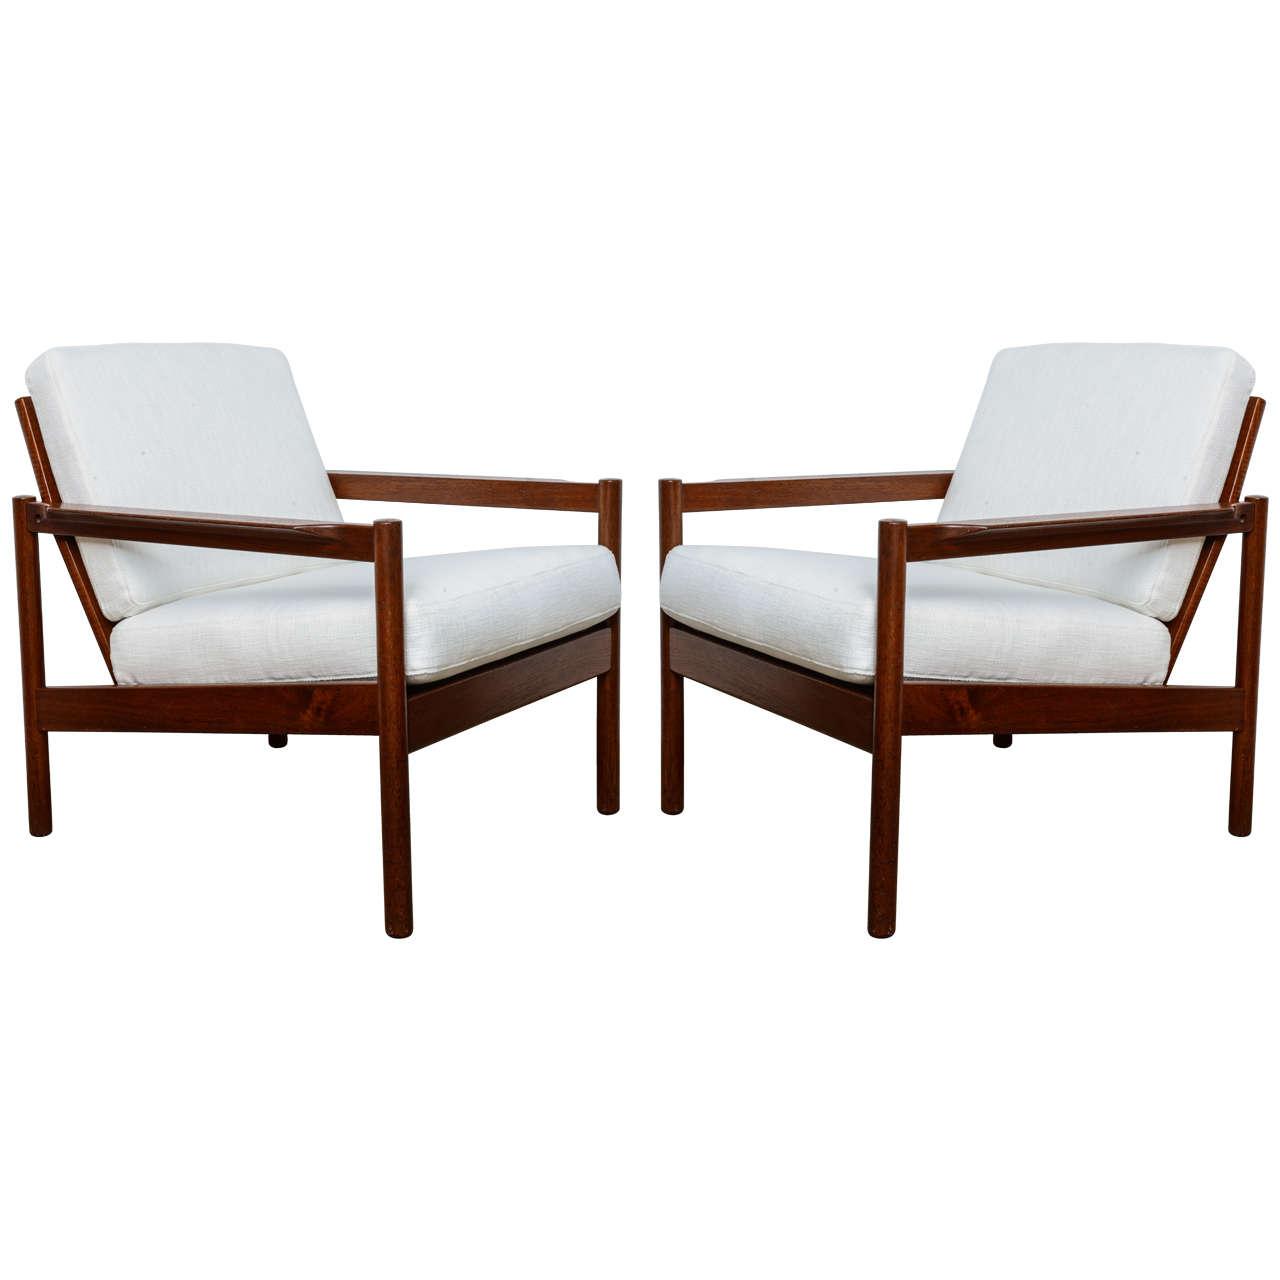 Pair Of Midcentury Modern Teak Danish Chairs At 1stdibs